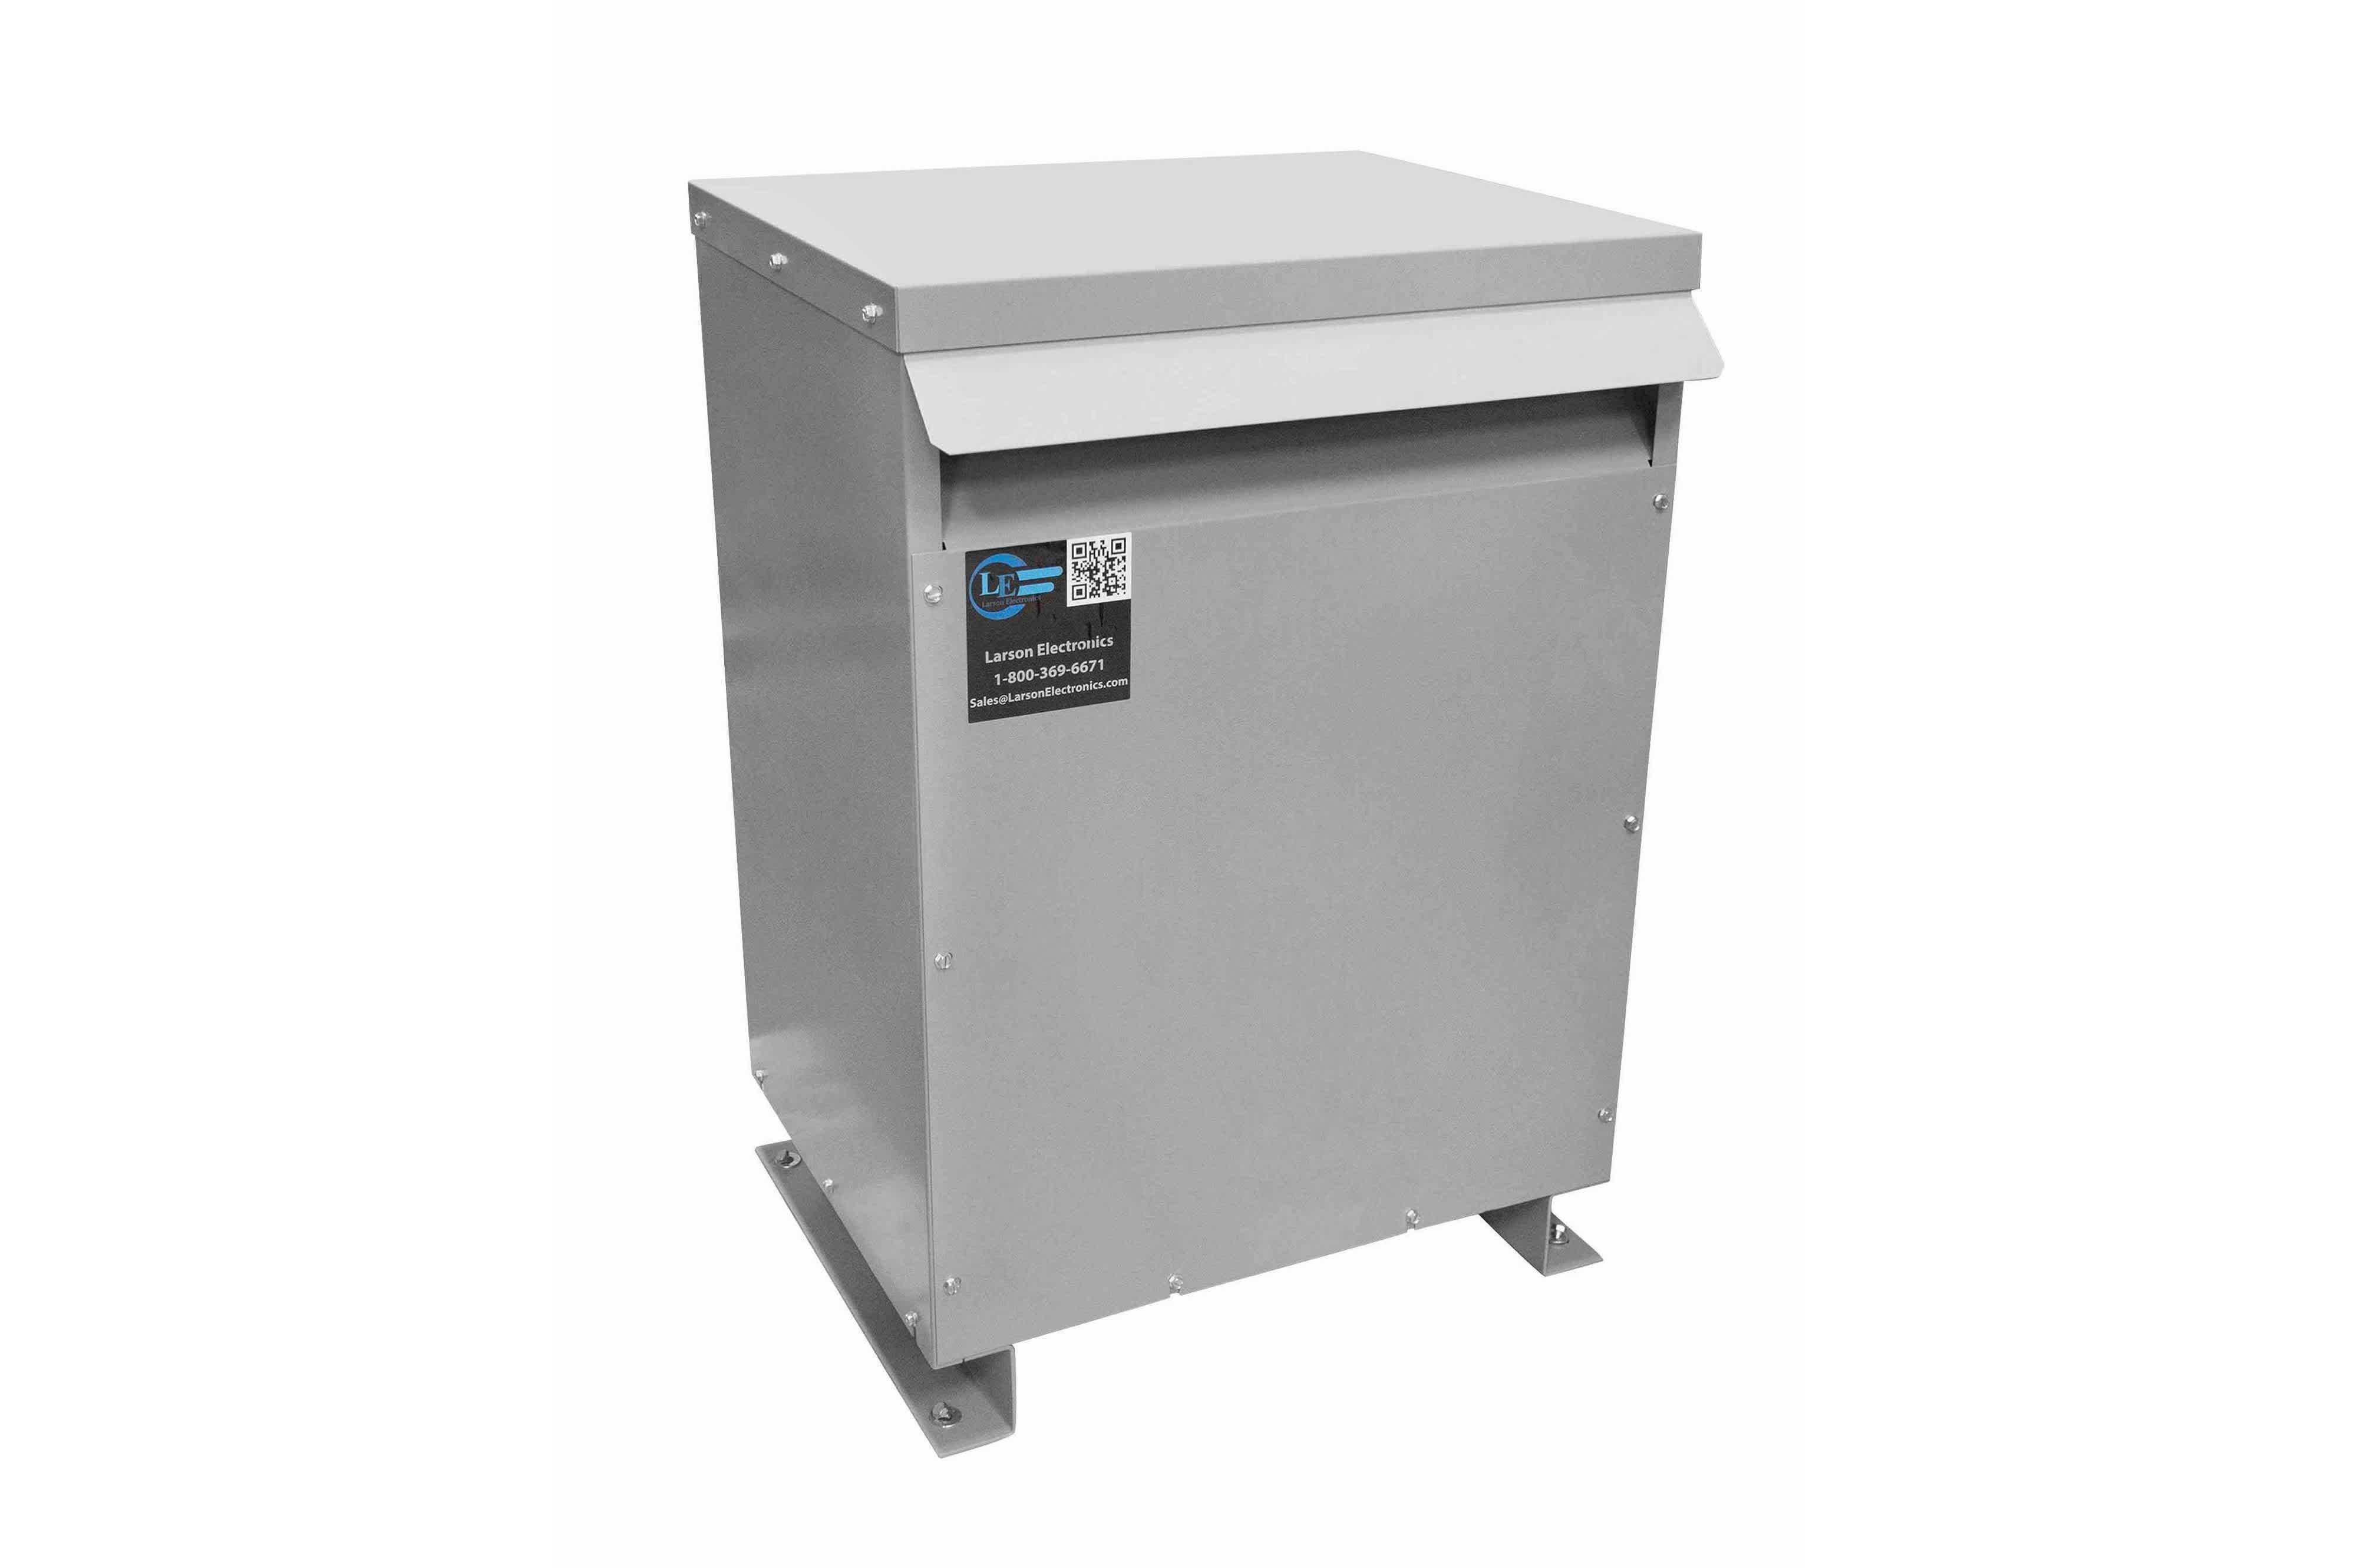 26 kVA 3PH Isolation Transformer, 480V Wye Primary, 240V/120 Delta Secondary, N3R, Ventilated, 60 Hz